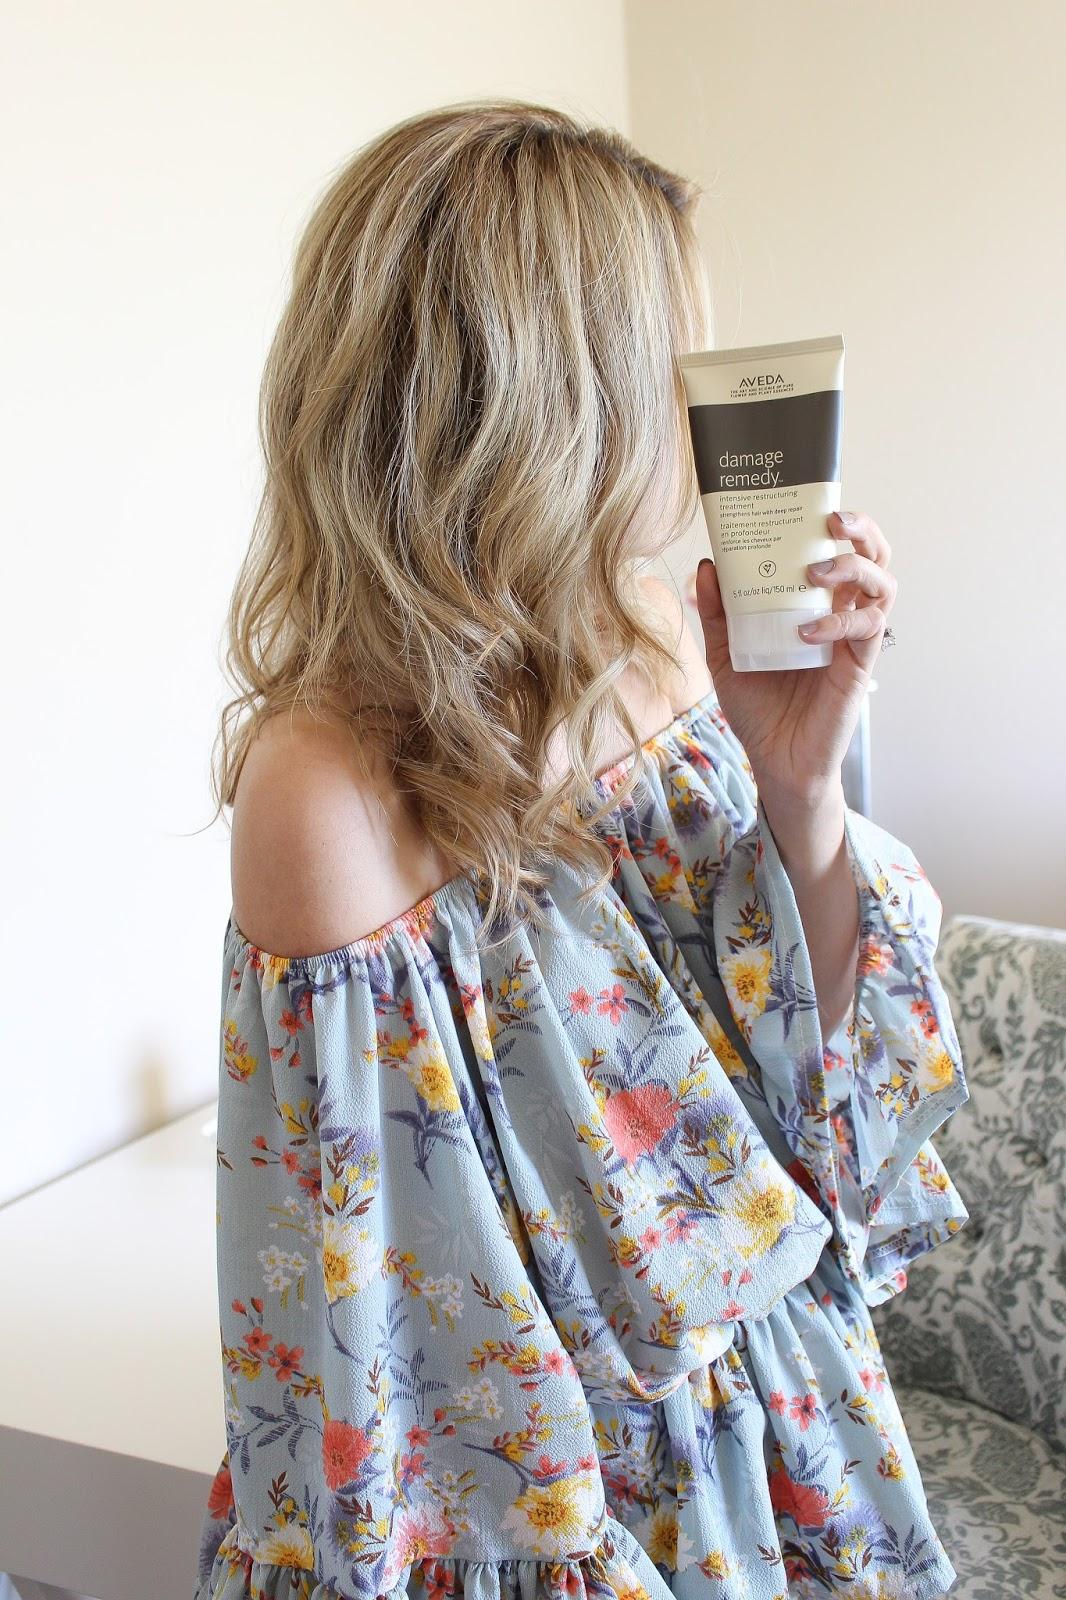 hair care - hair - Aveda - blonde - healthy hair